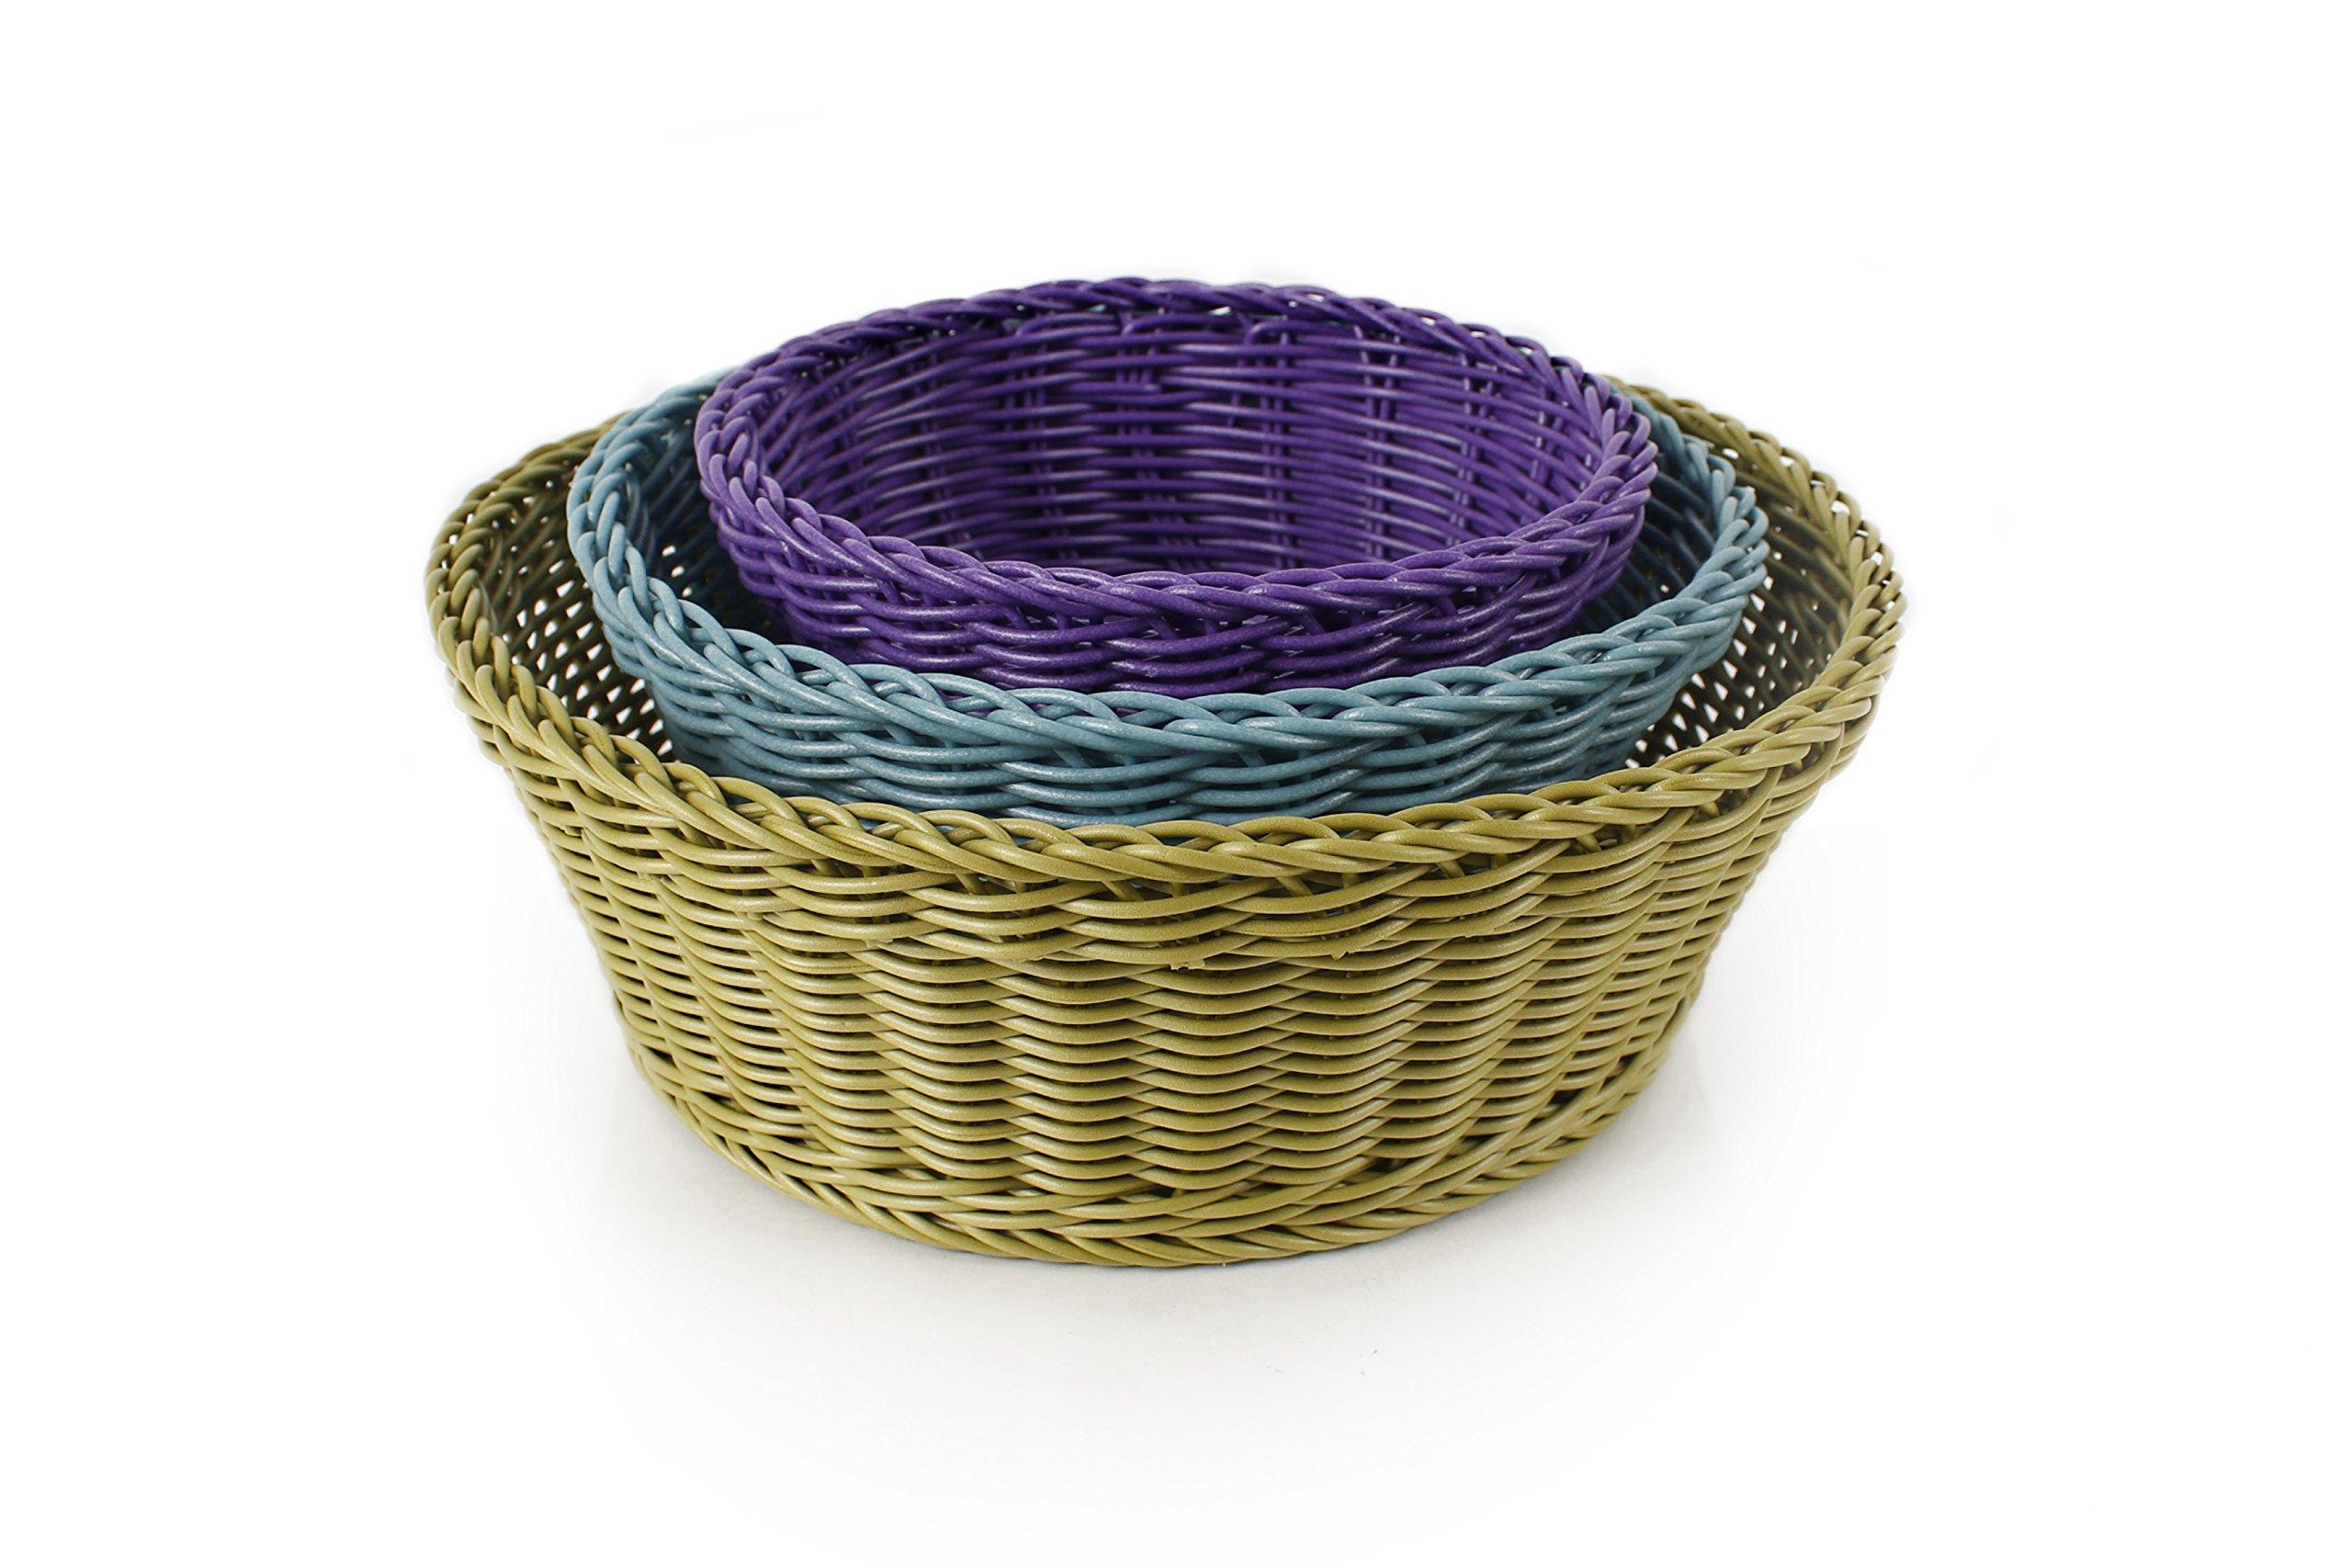 Neoflam 3-Piece Plasket Poly-Wicker Round Baskets Set